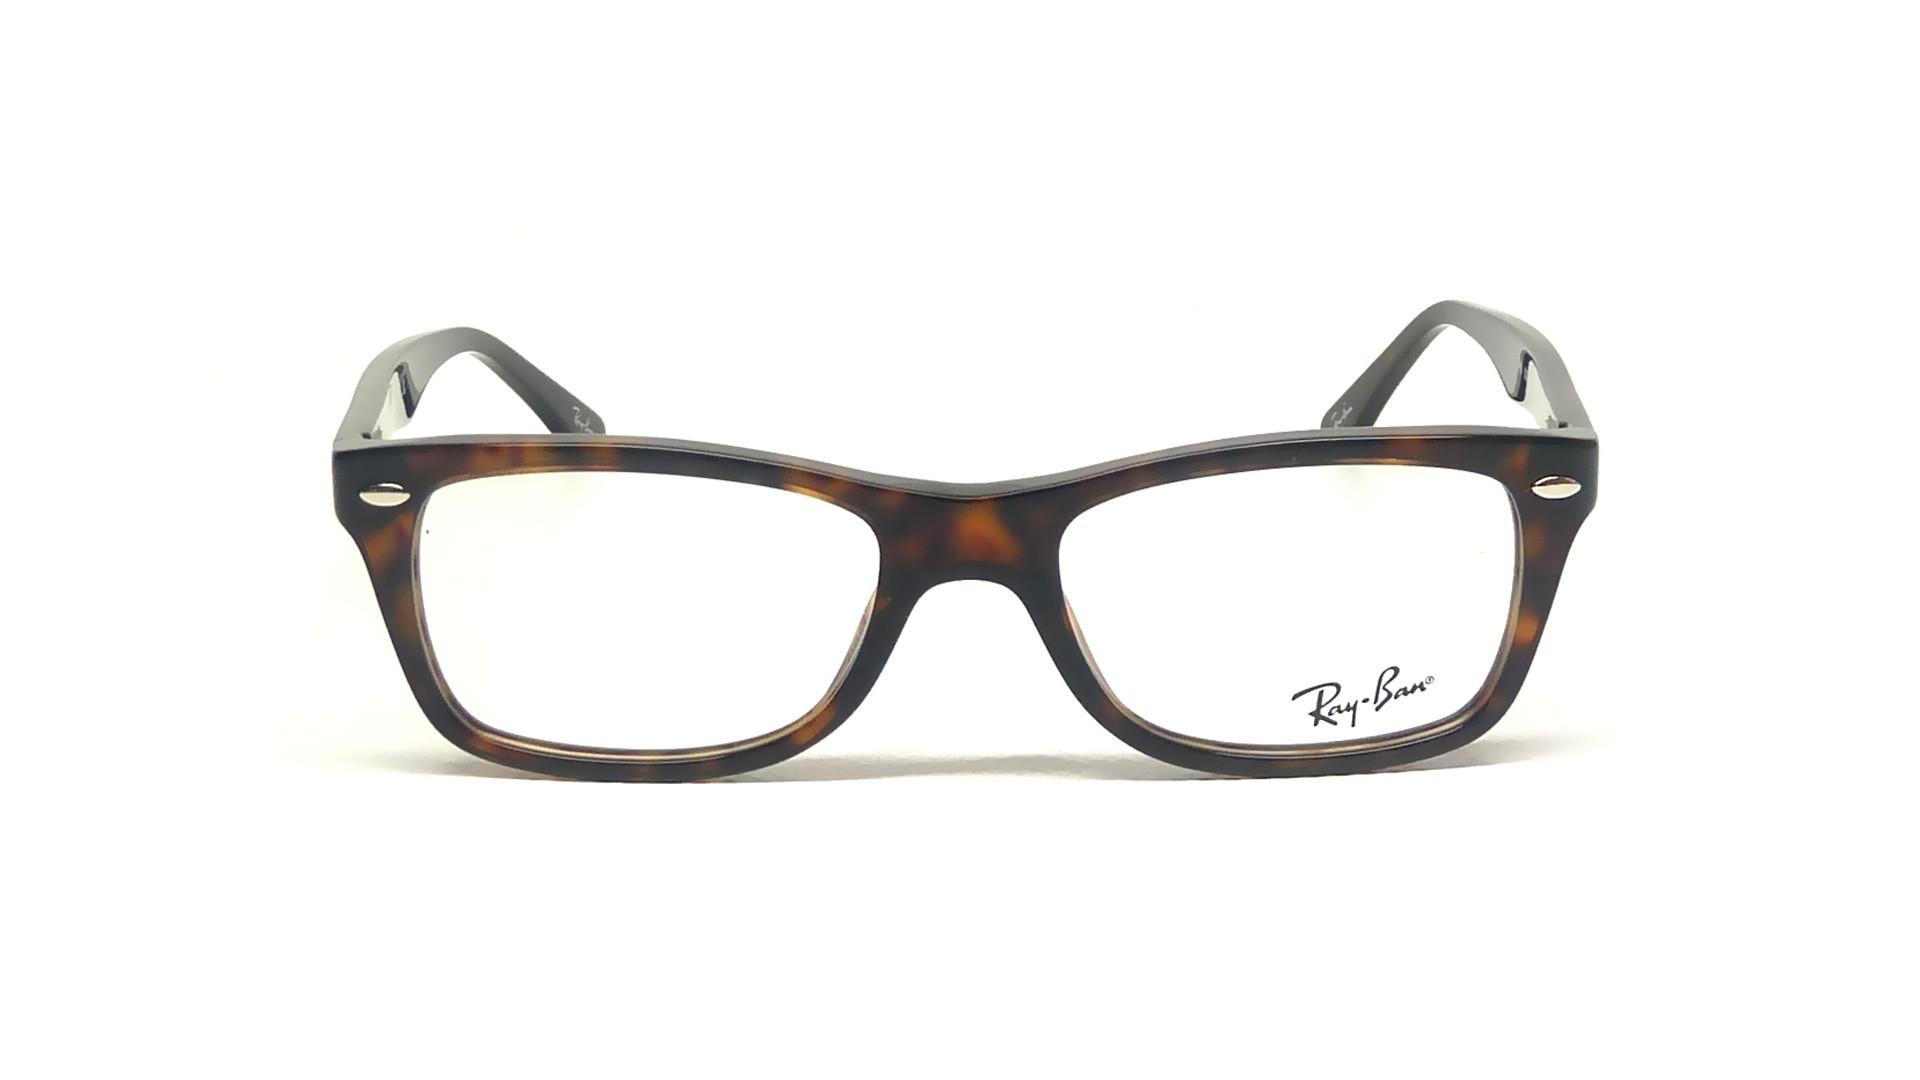 2a0e353a8d3 Ray Ban Rx5228 Eyeglasses 55 « Heritage Malta